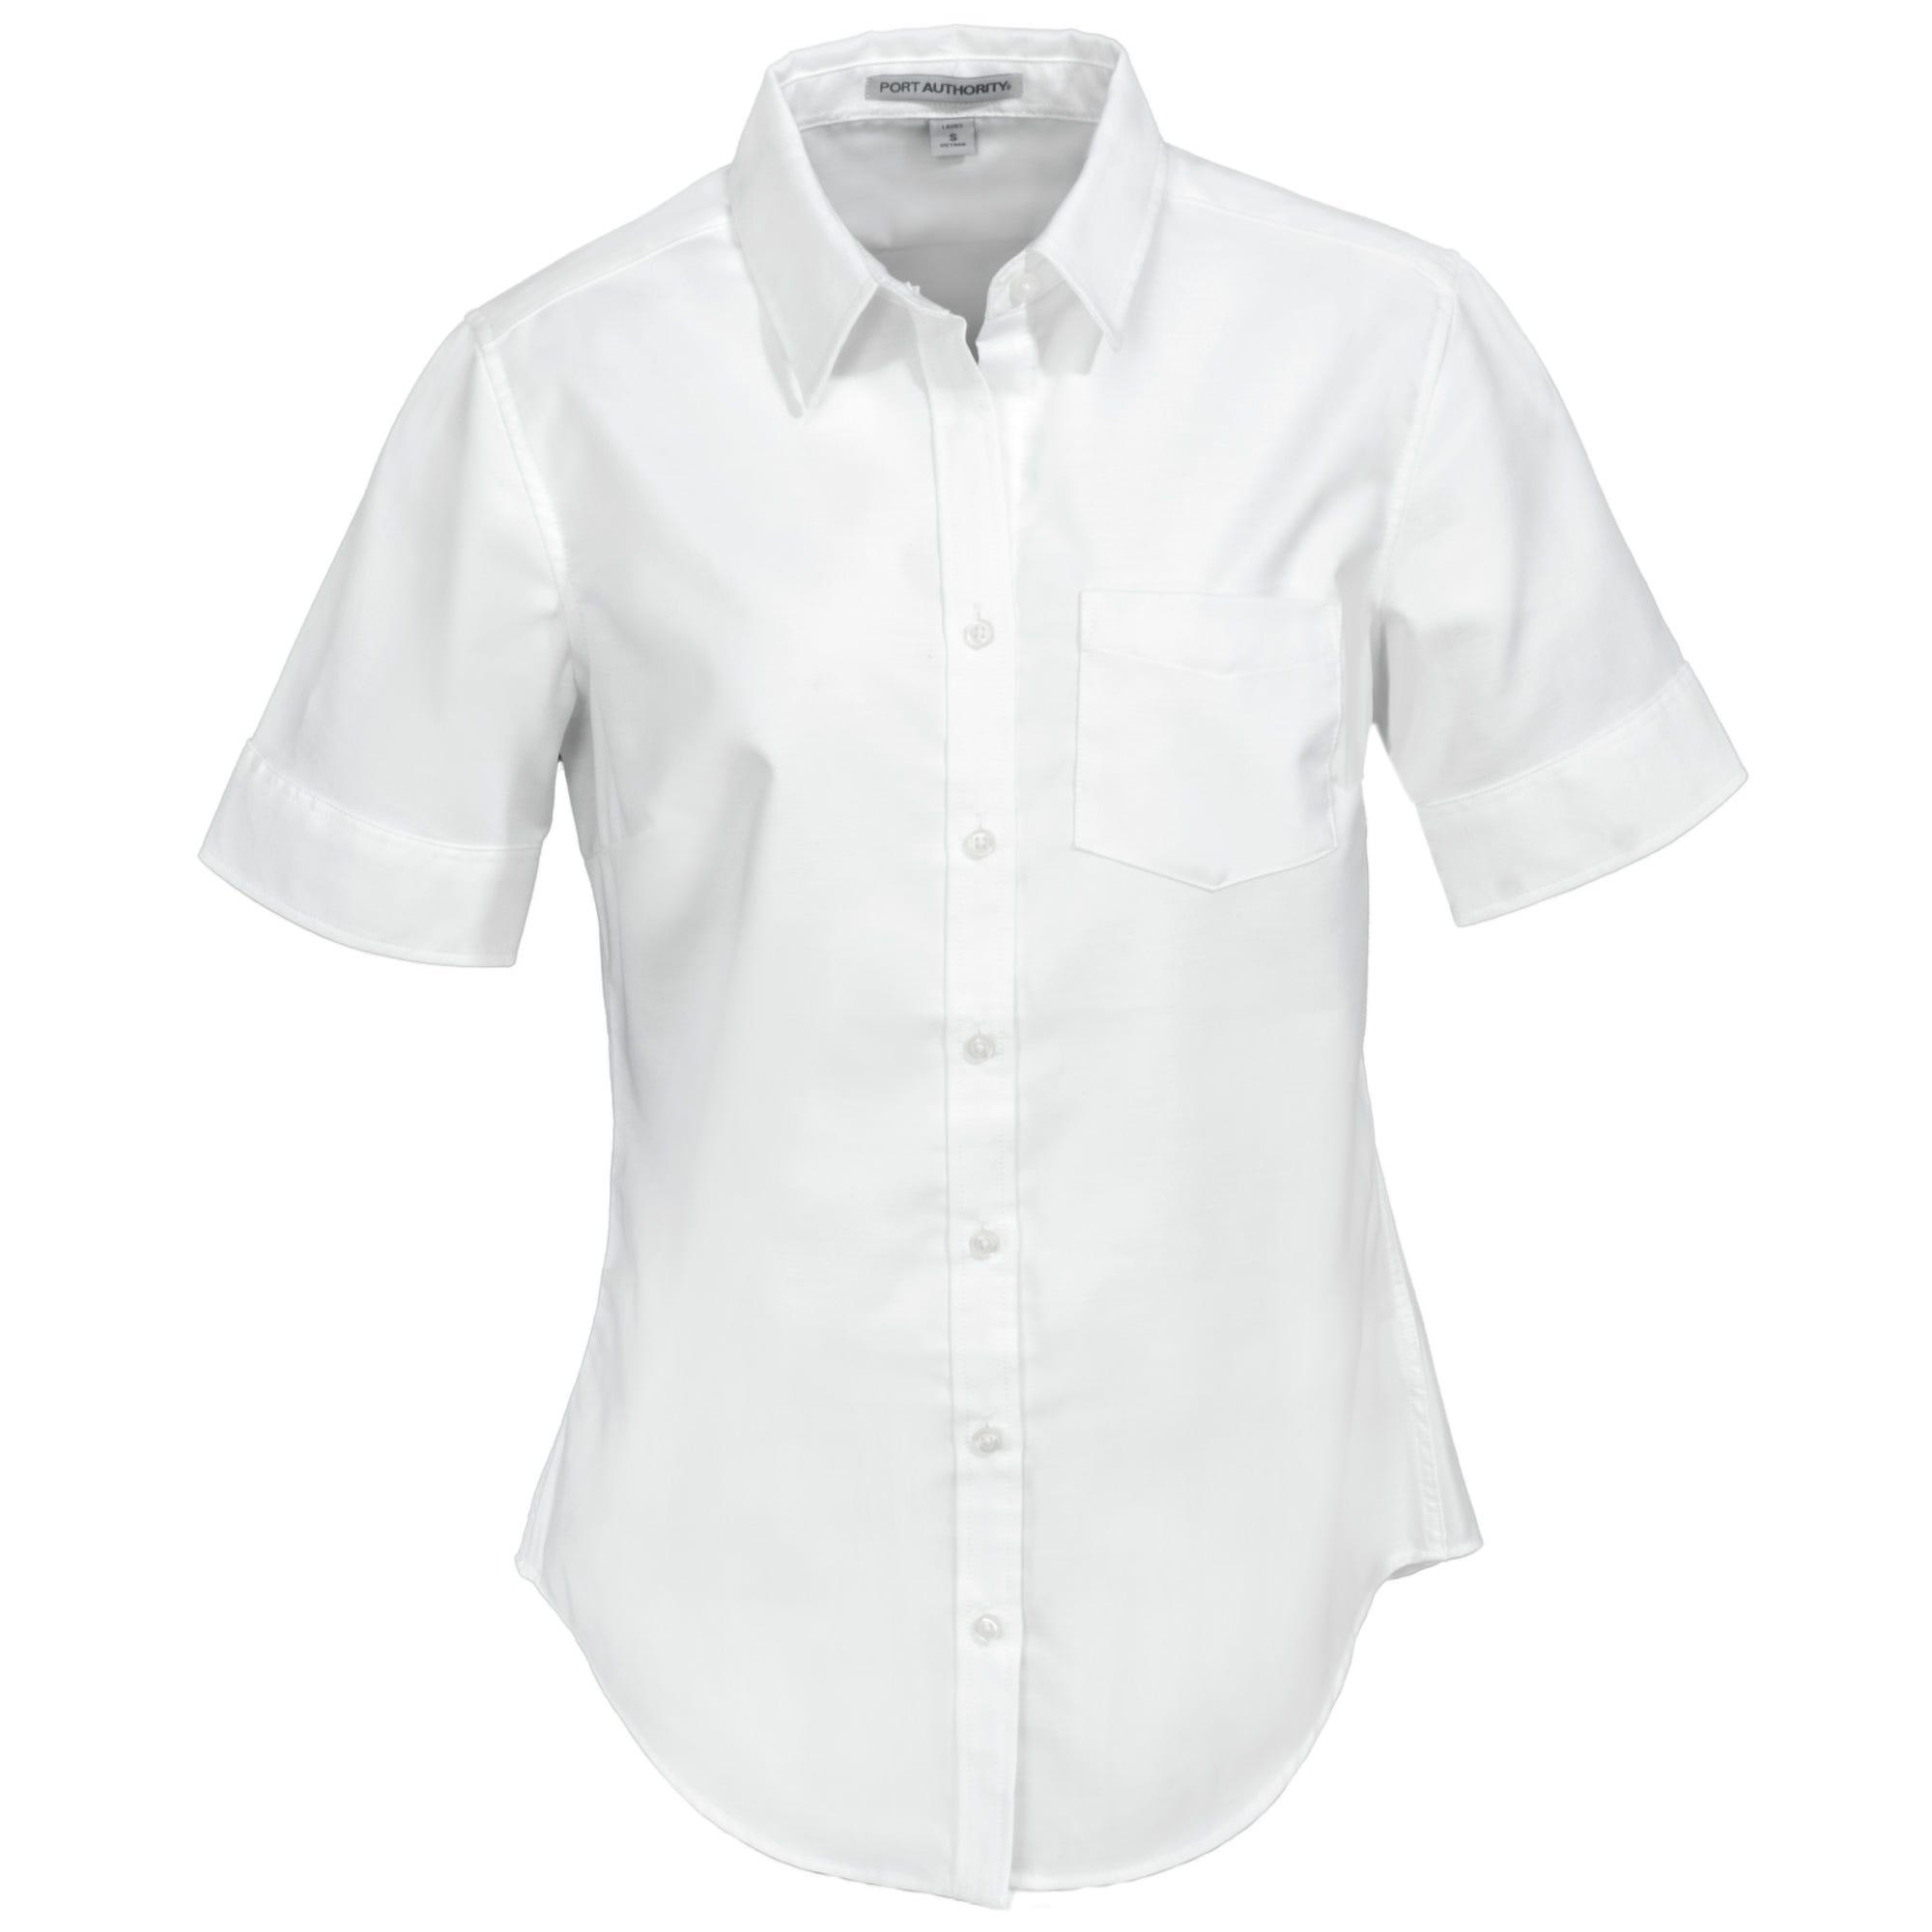 Port Authority Women's L659 WHT White SuperPro Oxford Short-Sleeve Shirt